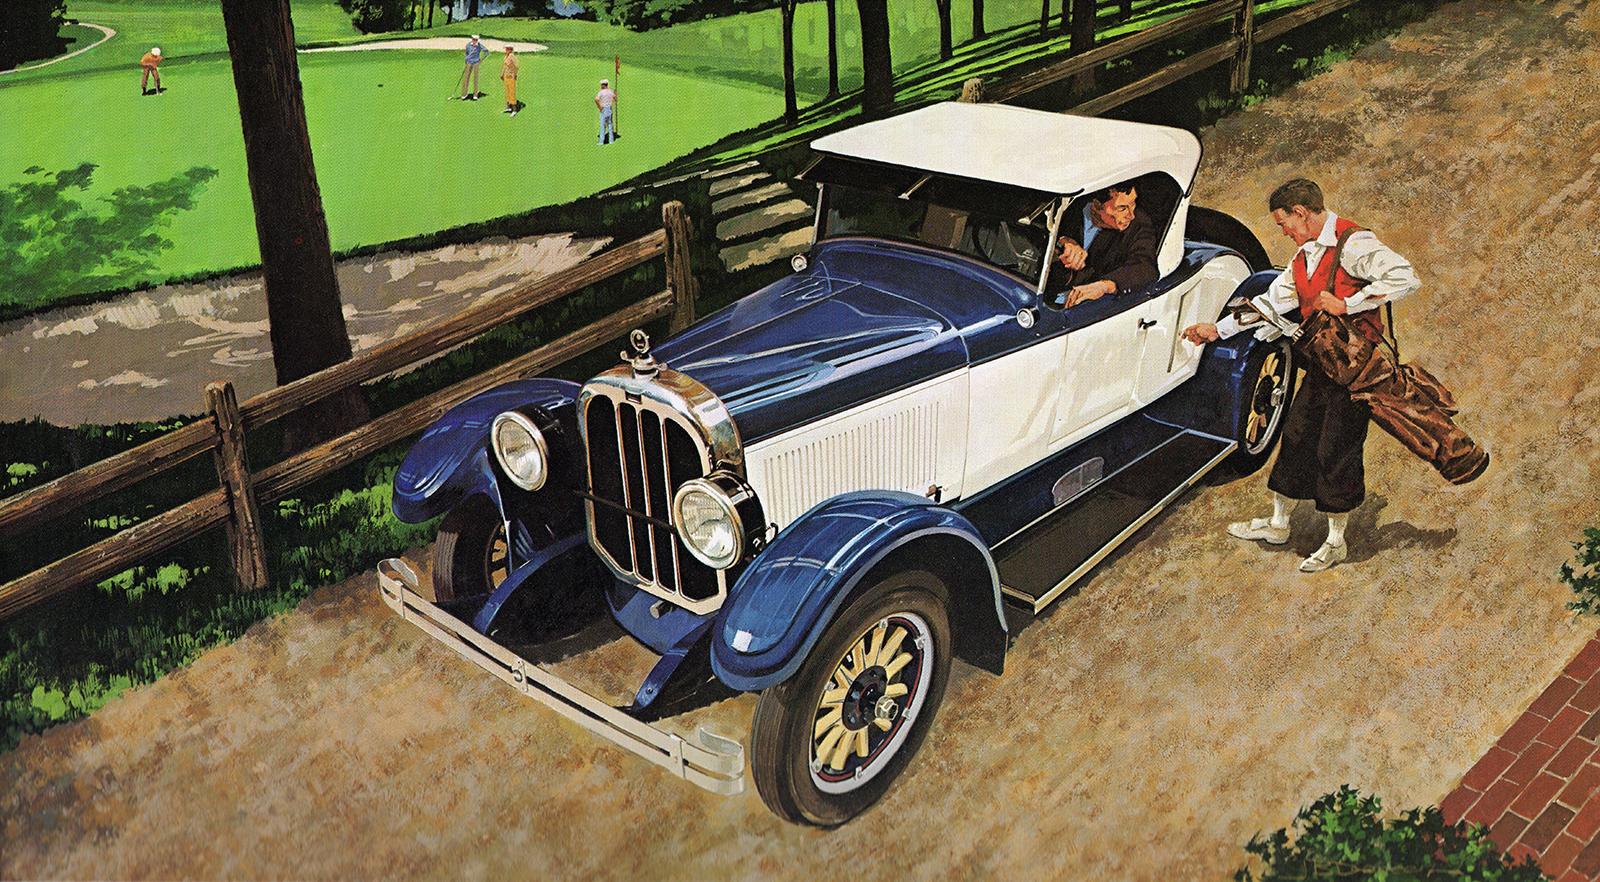 1926. Chandler Comrade Roadster. Illustrated by James B. Deneen